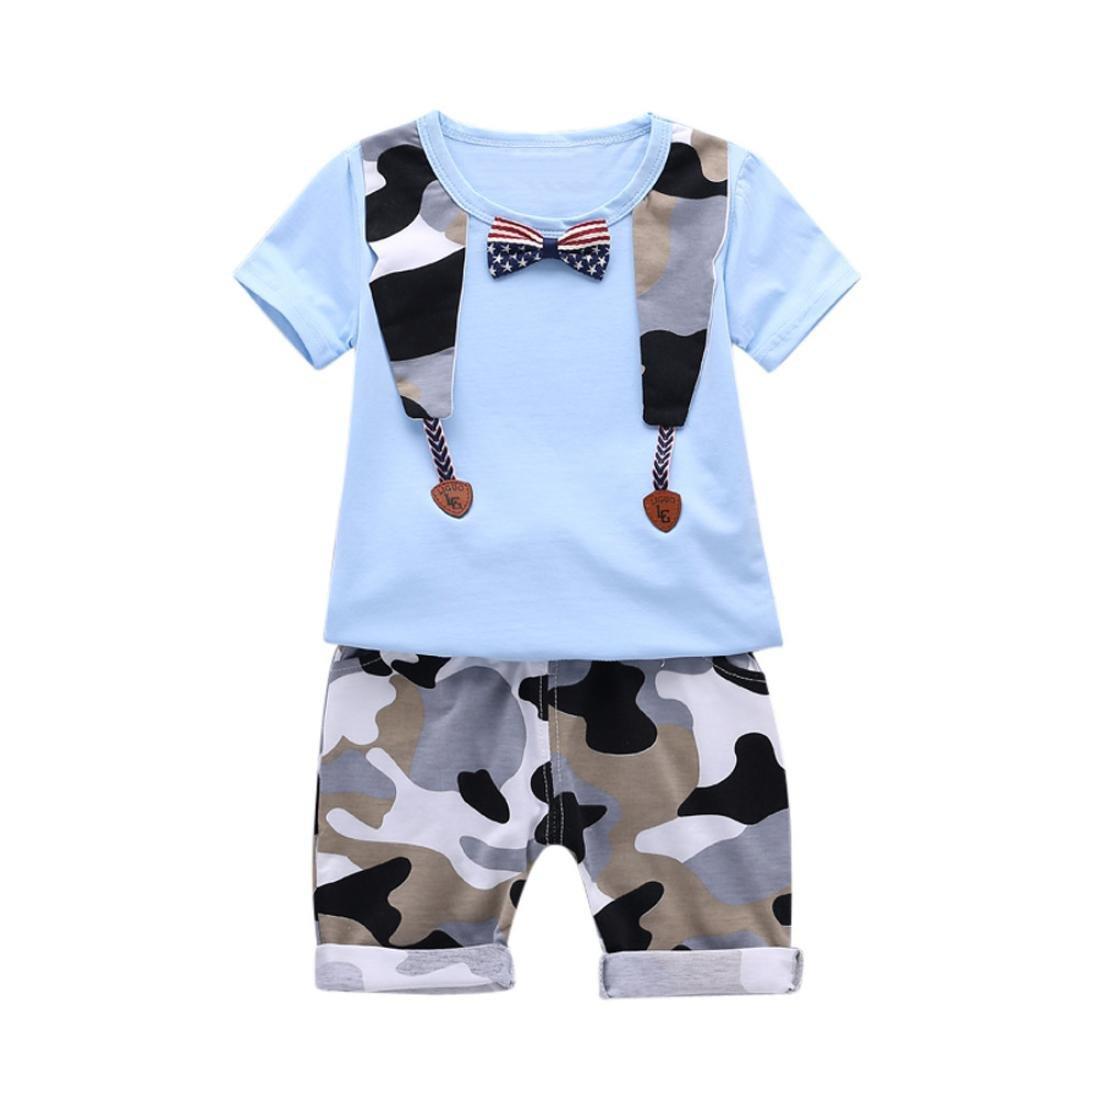 CDHL99 Cute Sea Otter Newborn Infant Baby Short Sleeve Romper Pajamas 0-2T